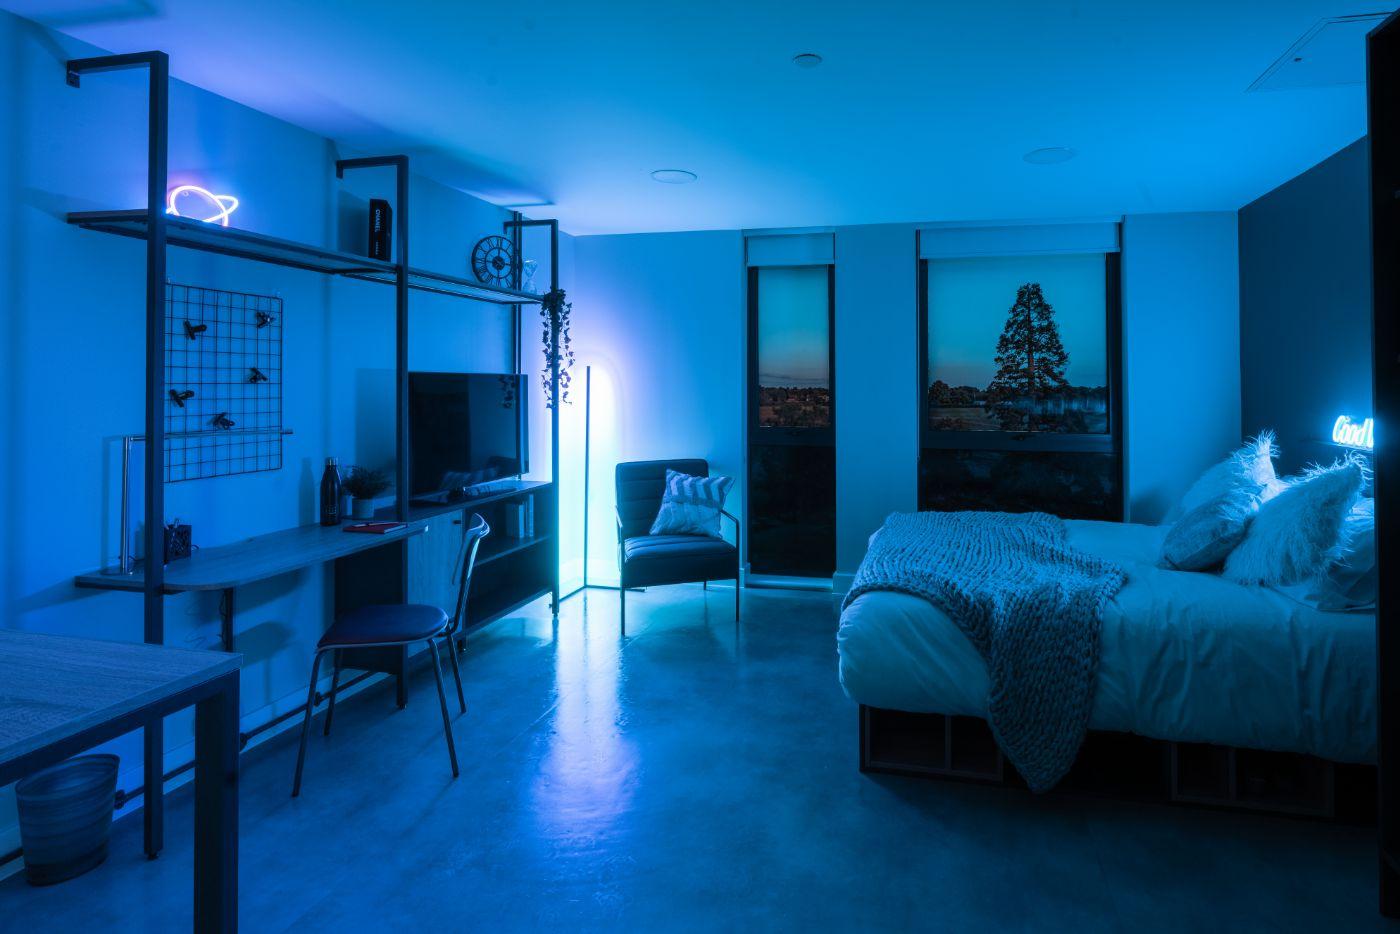 studio bedroom the vantage student accommodation